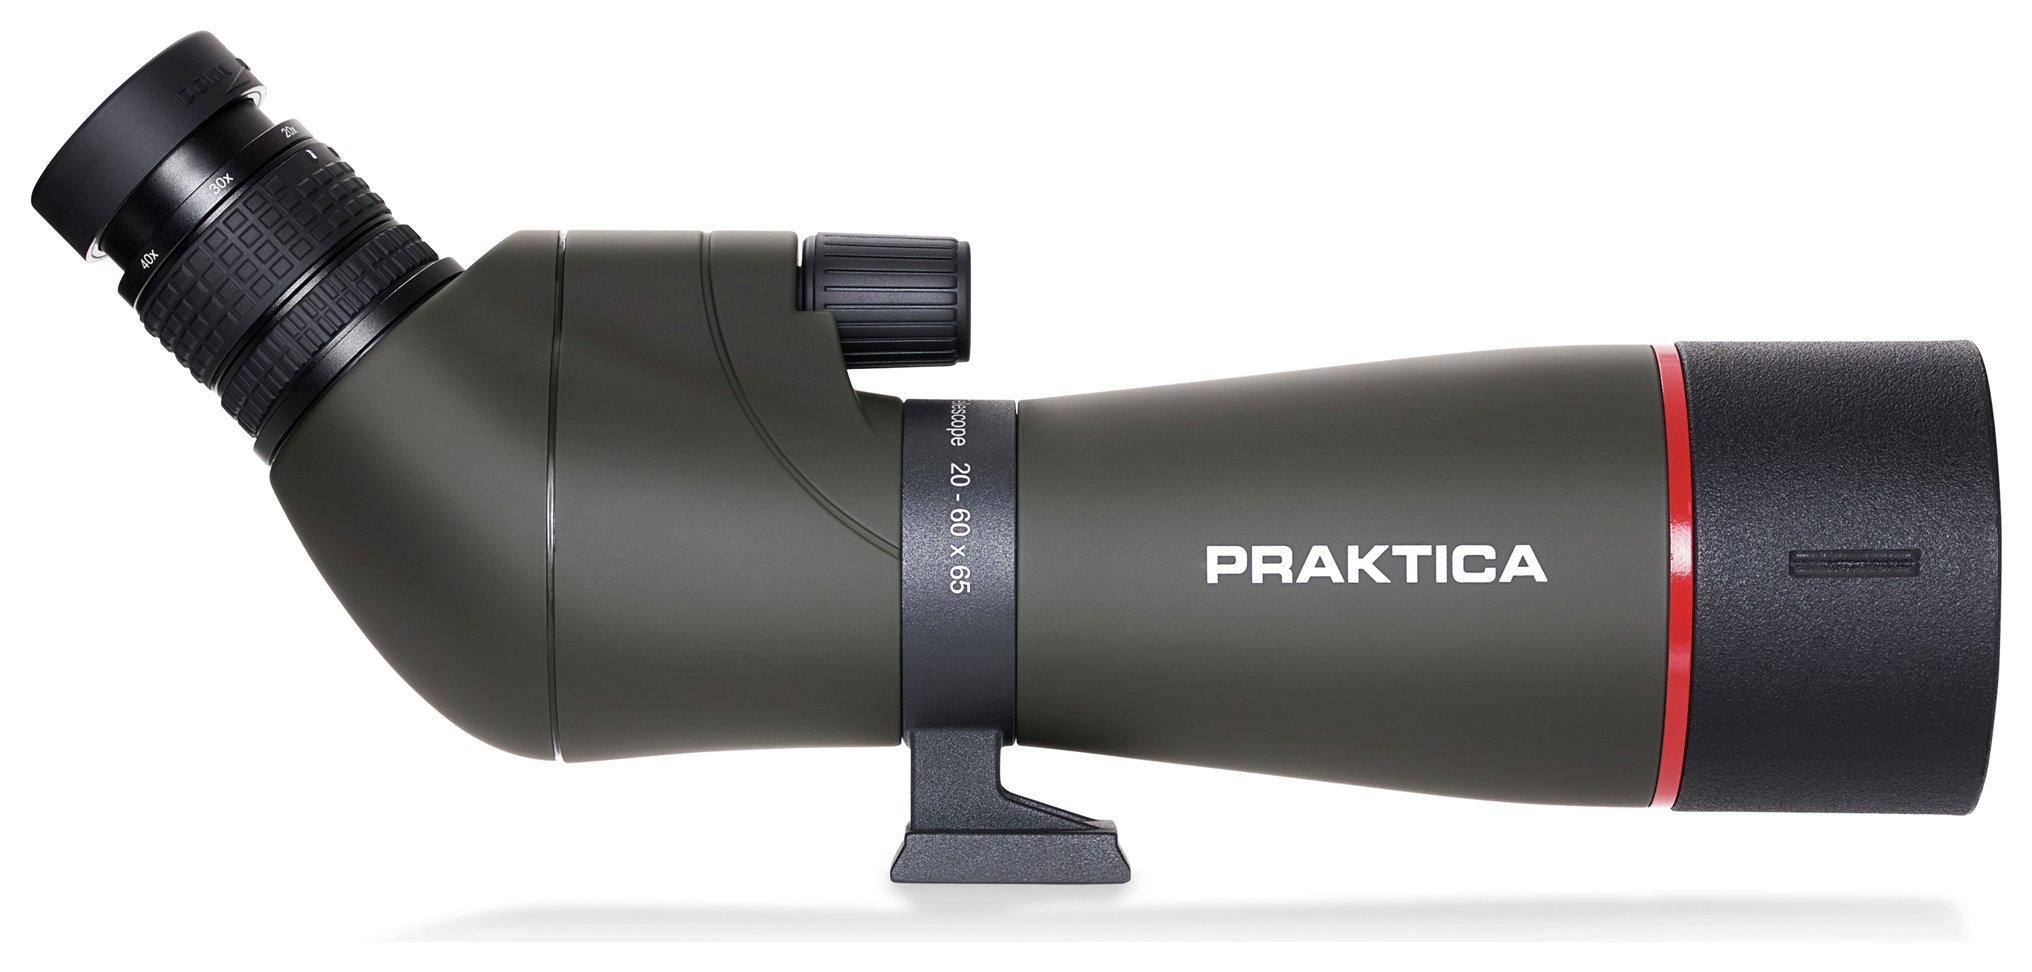 Praktica Alder 20-60 x 65mm Spotting Scope Kit.